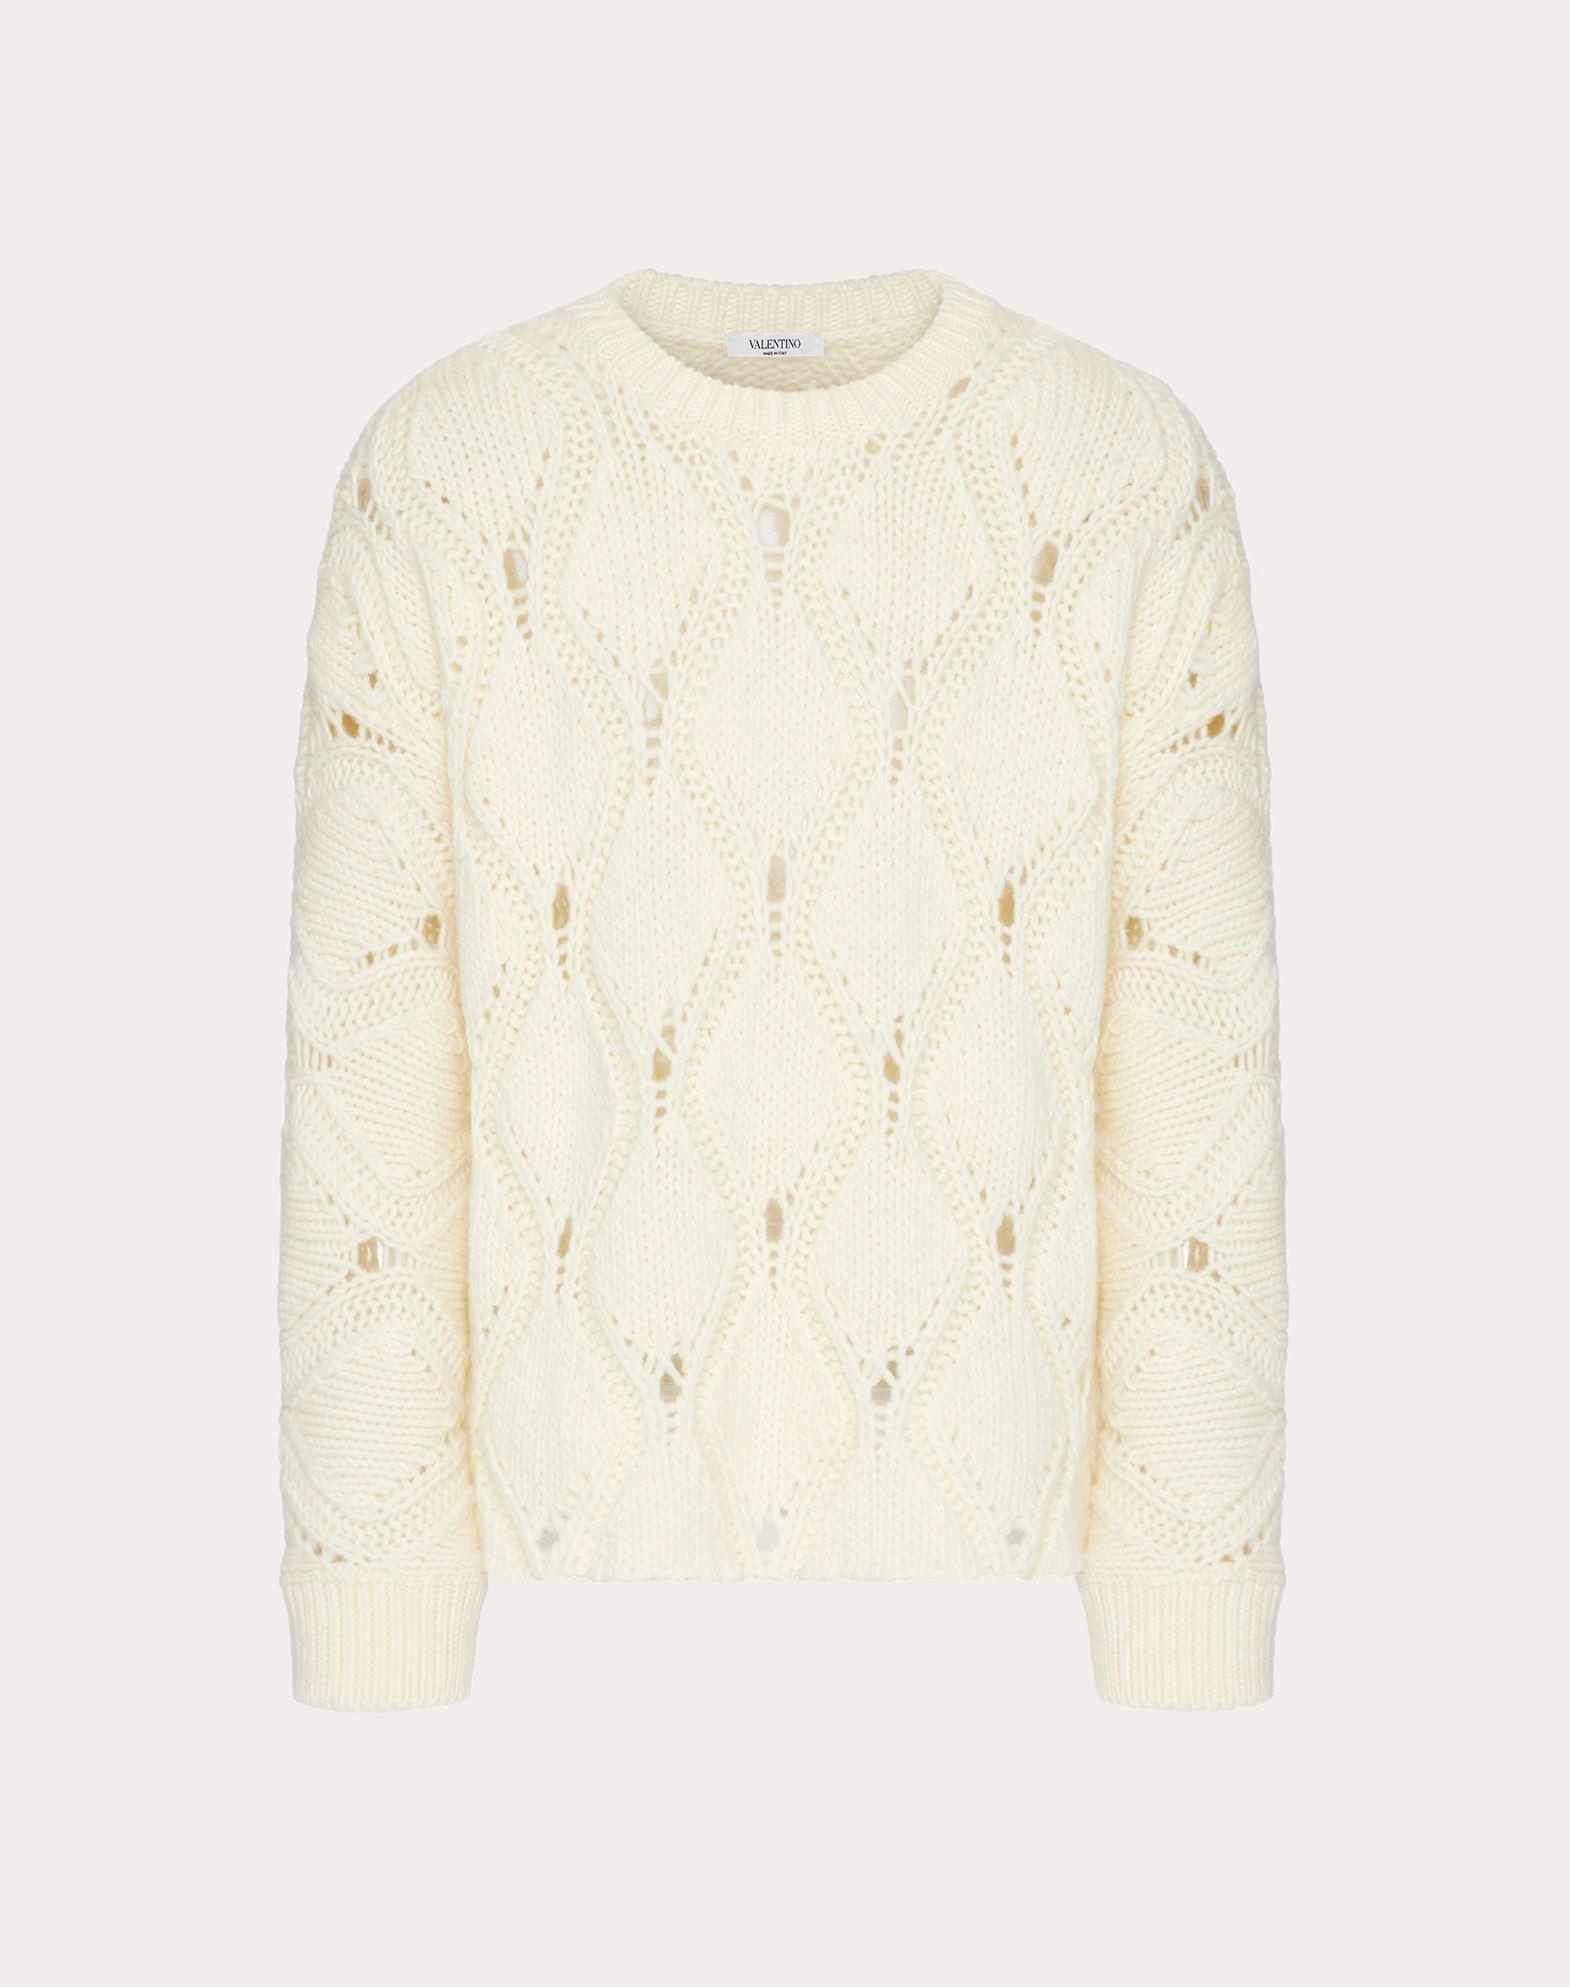 Valentino Uomo Wool Crewneck Sweater In Ivory